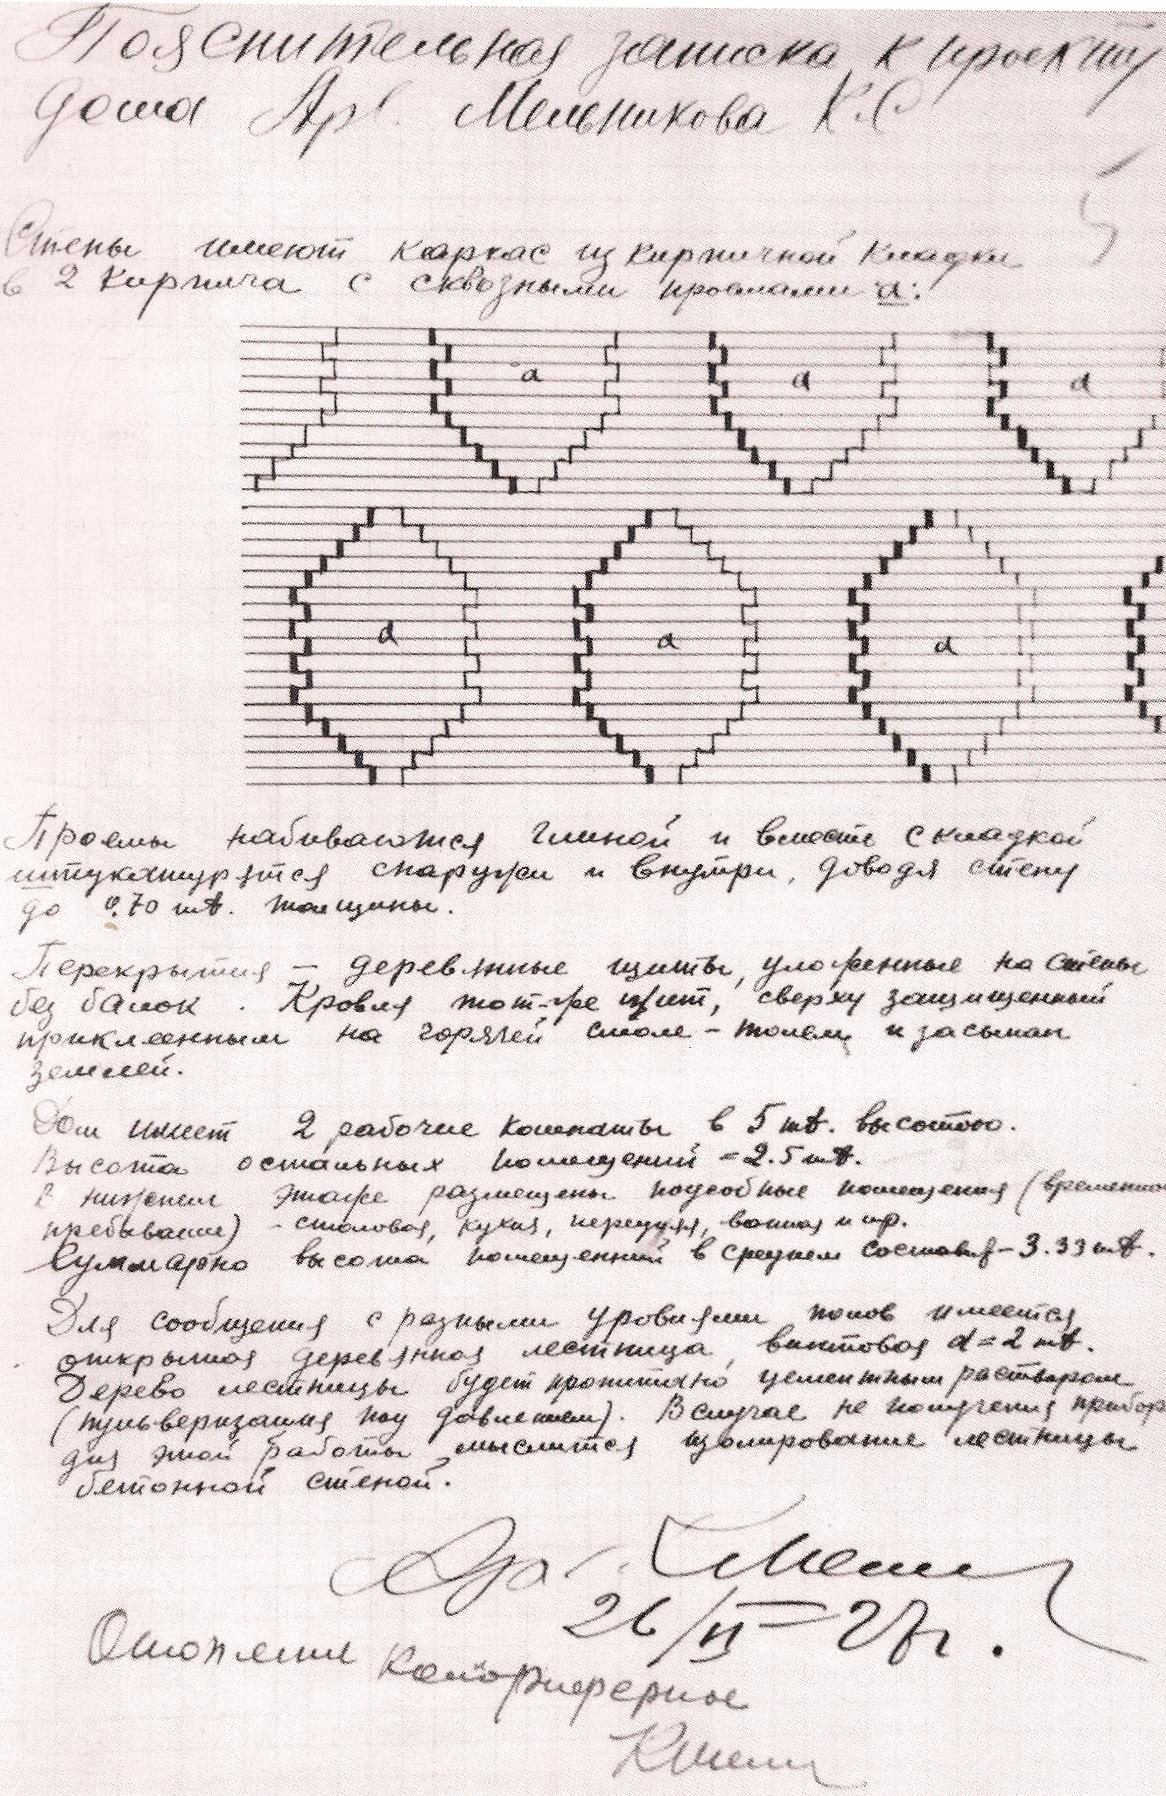 Konstantin Mel'nikov, early formulation of the hexagonal windows, accompanied by notes (1927)